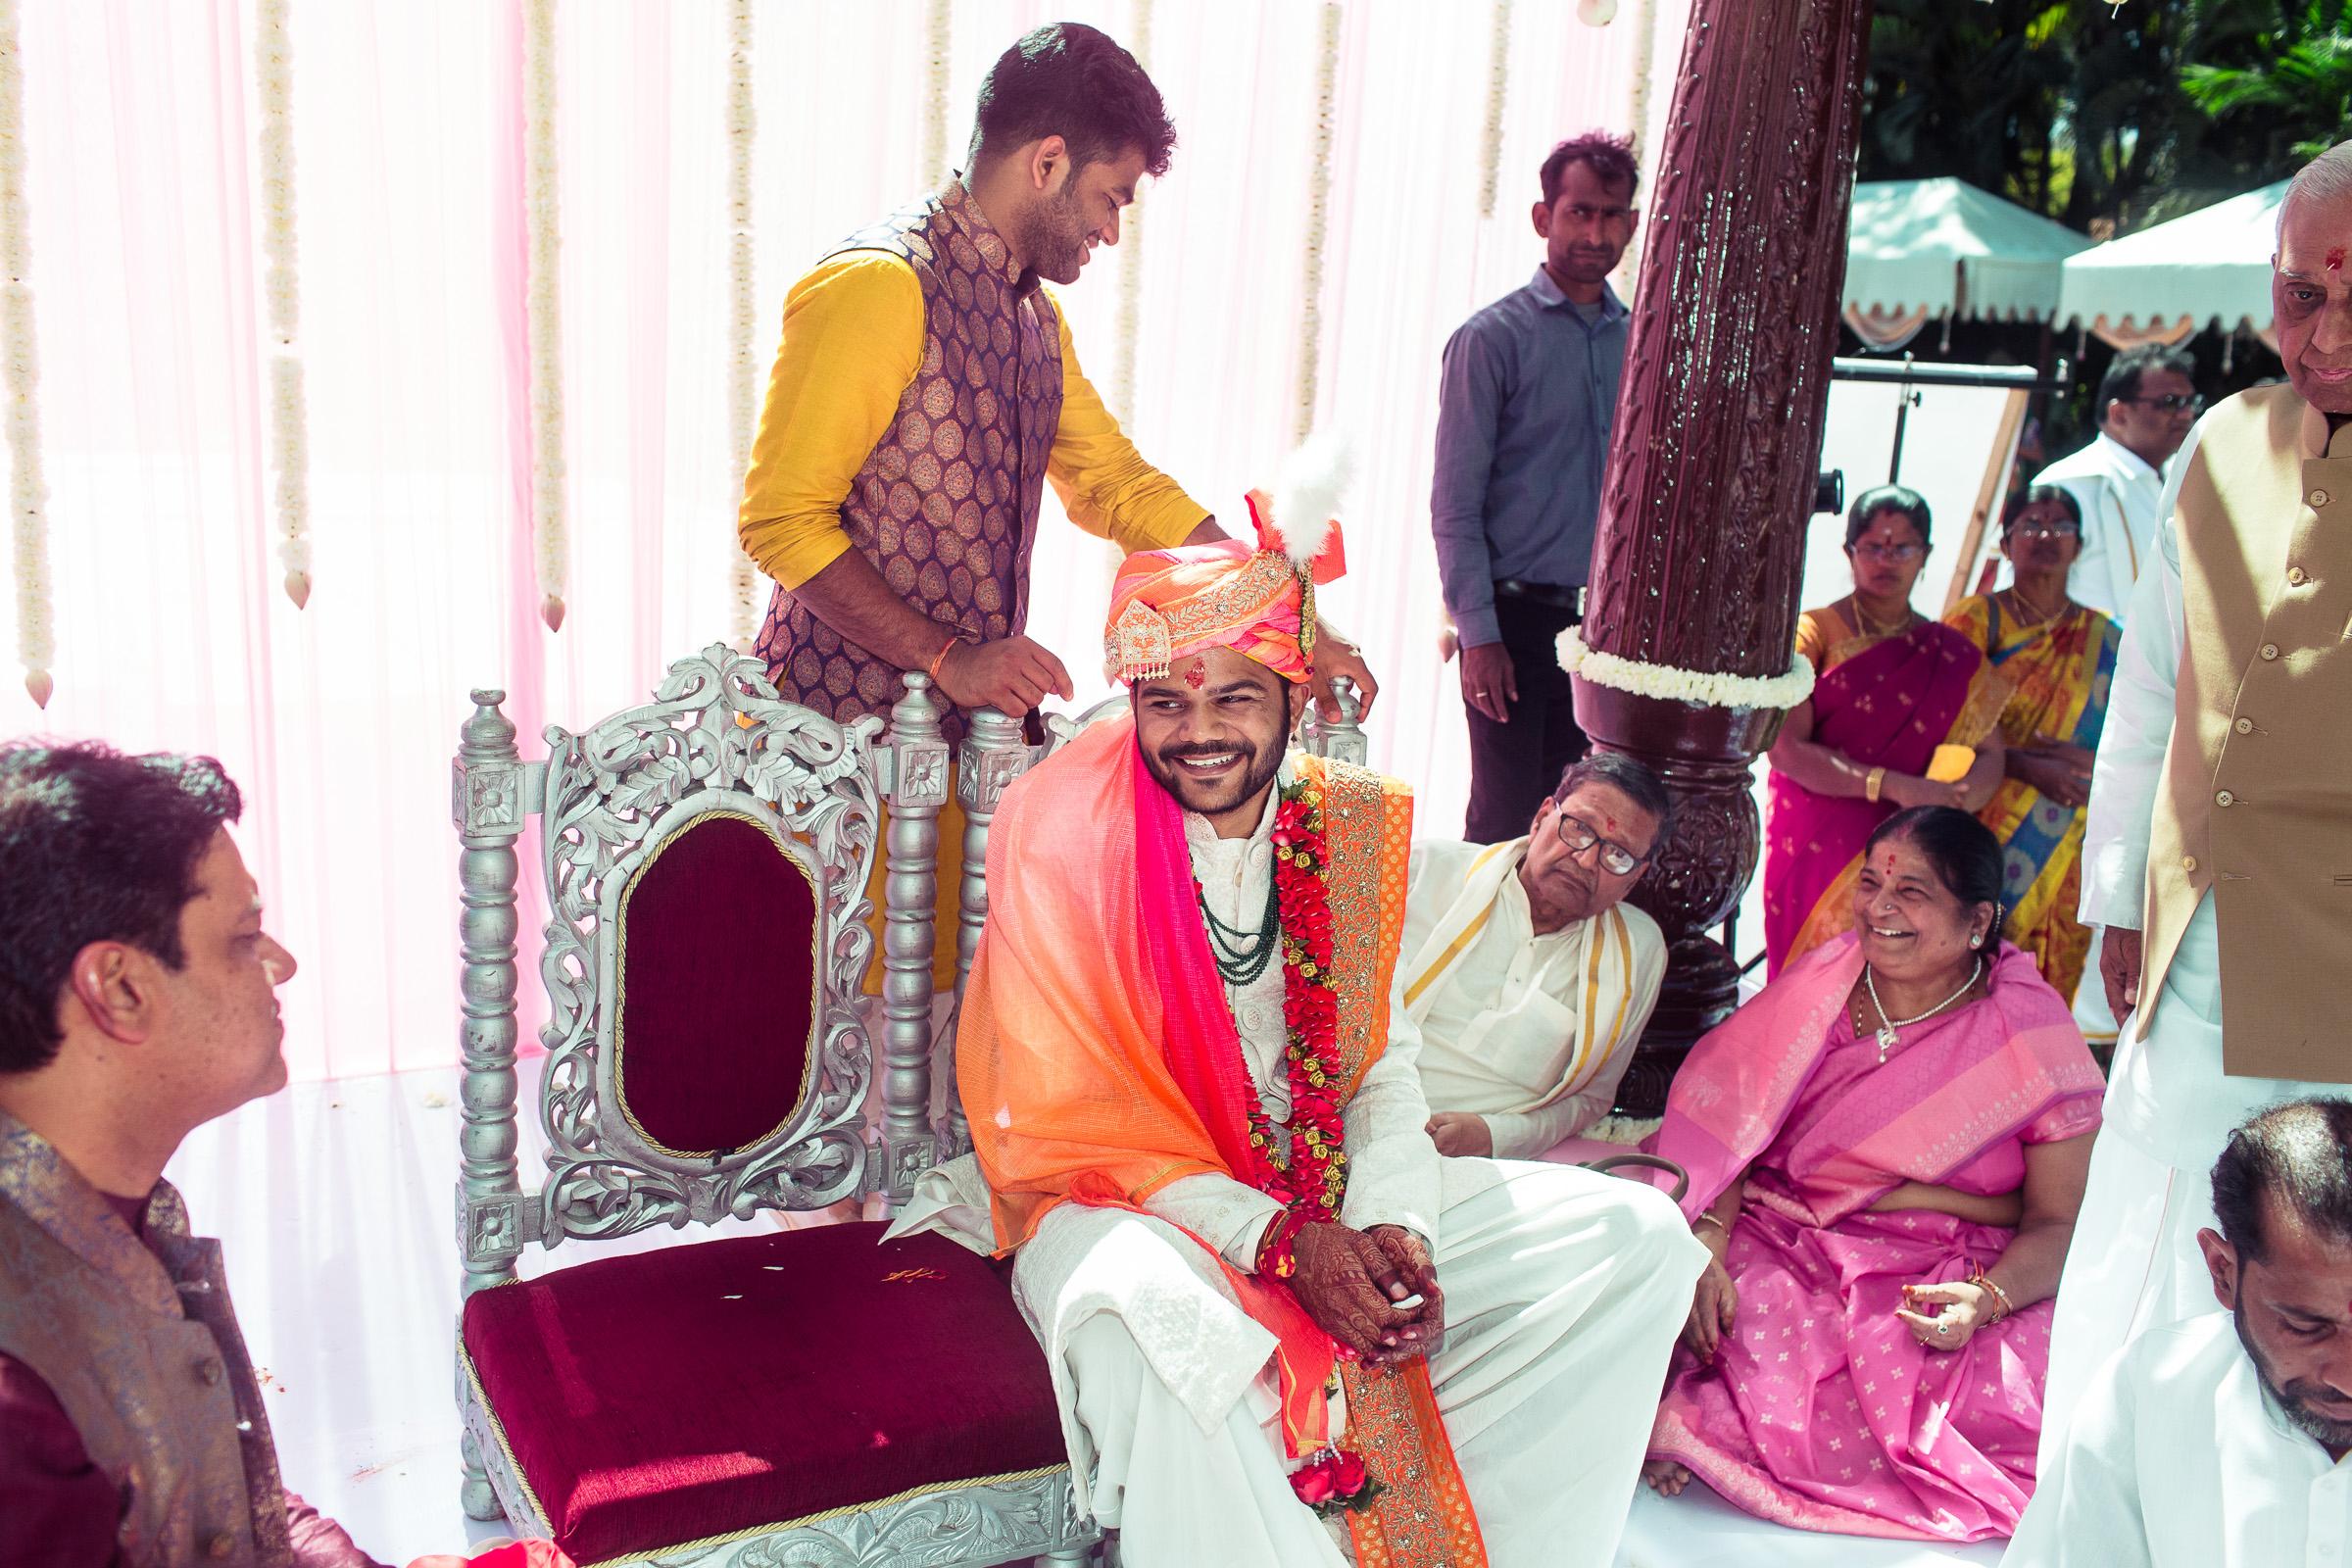 marwari-candid-wedding-photographers-bangalore-0033.jpg